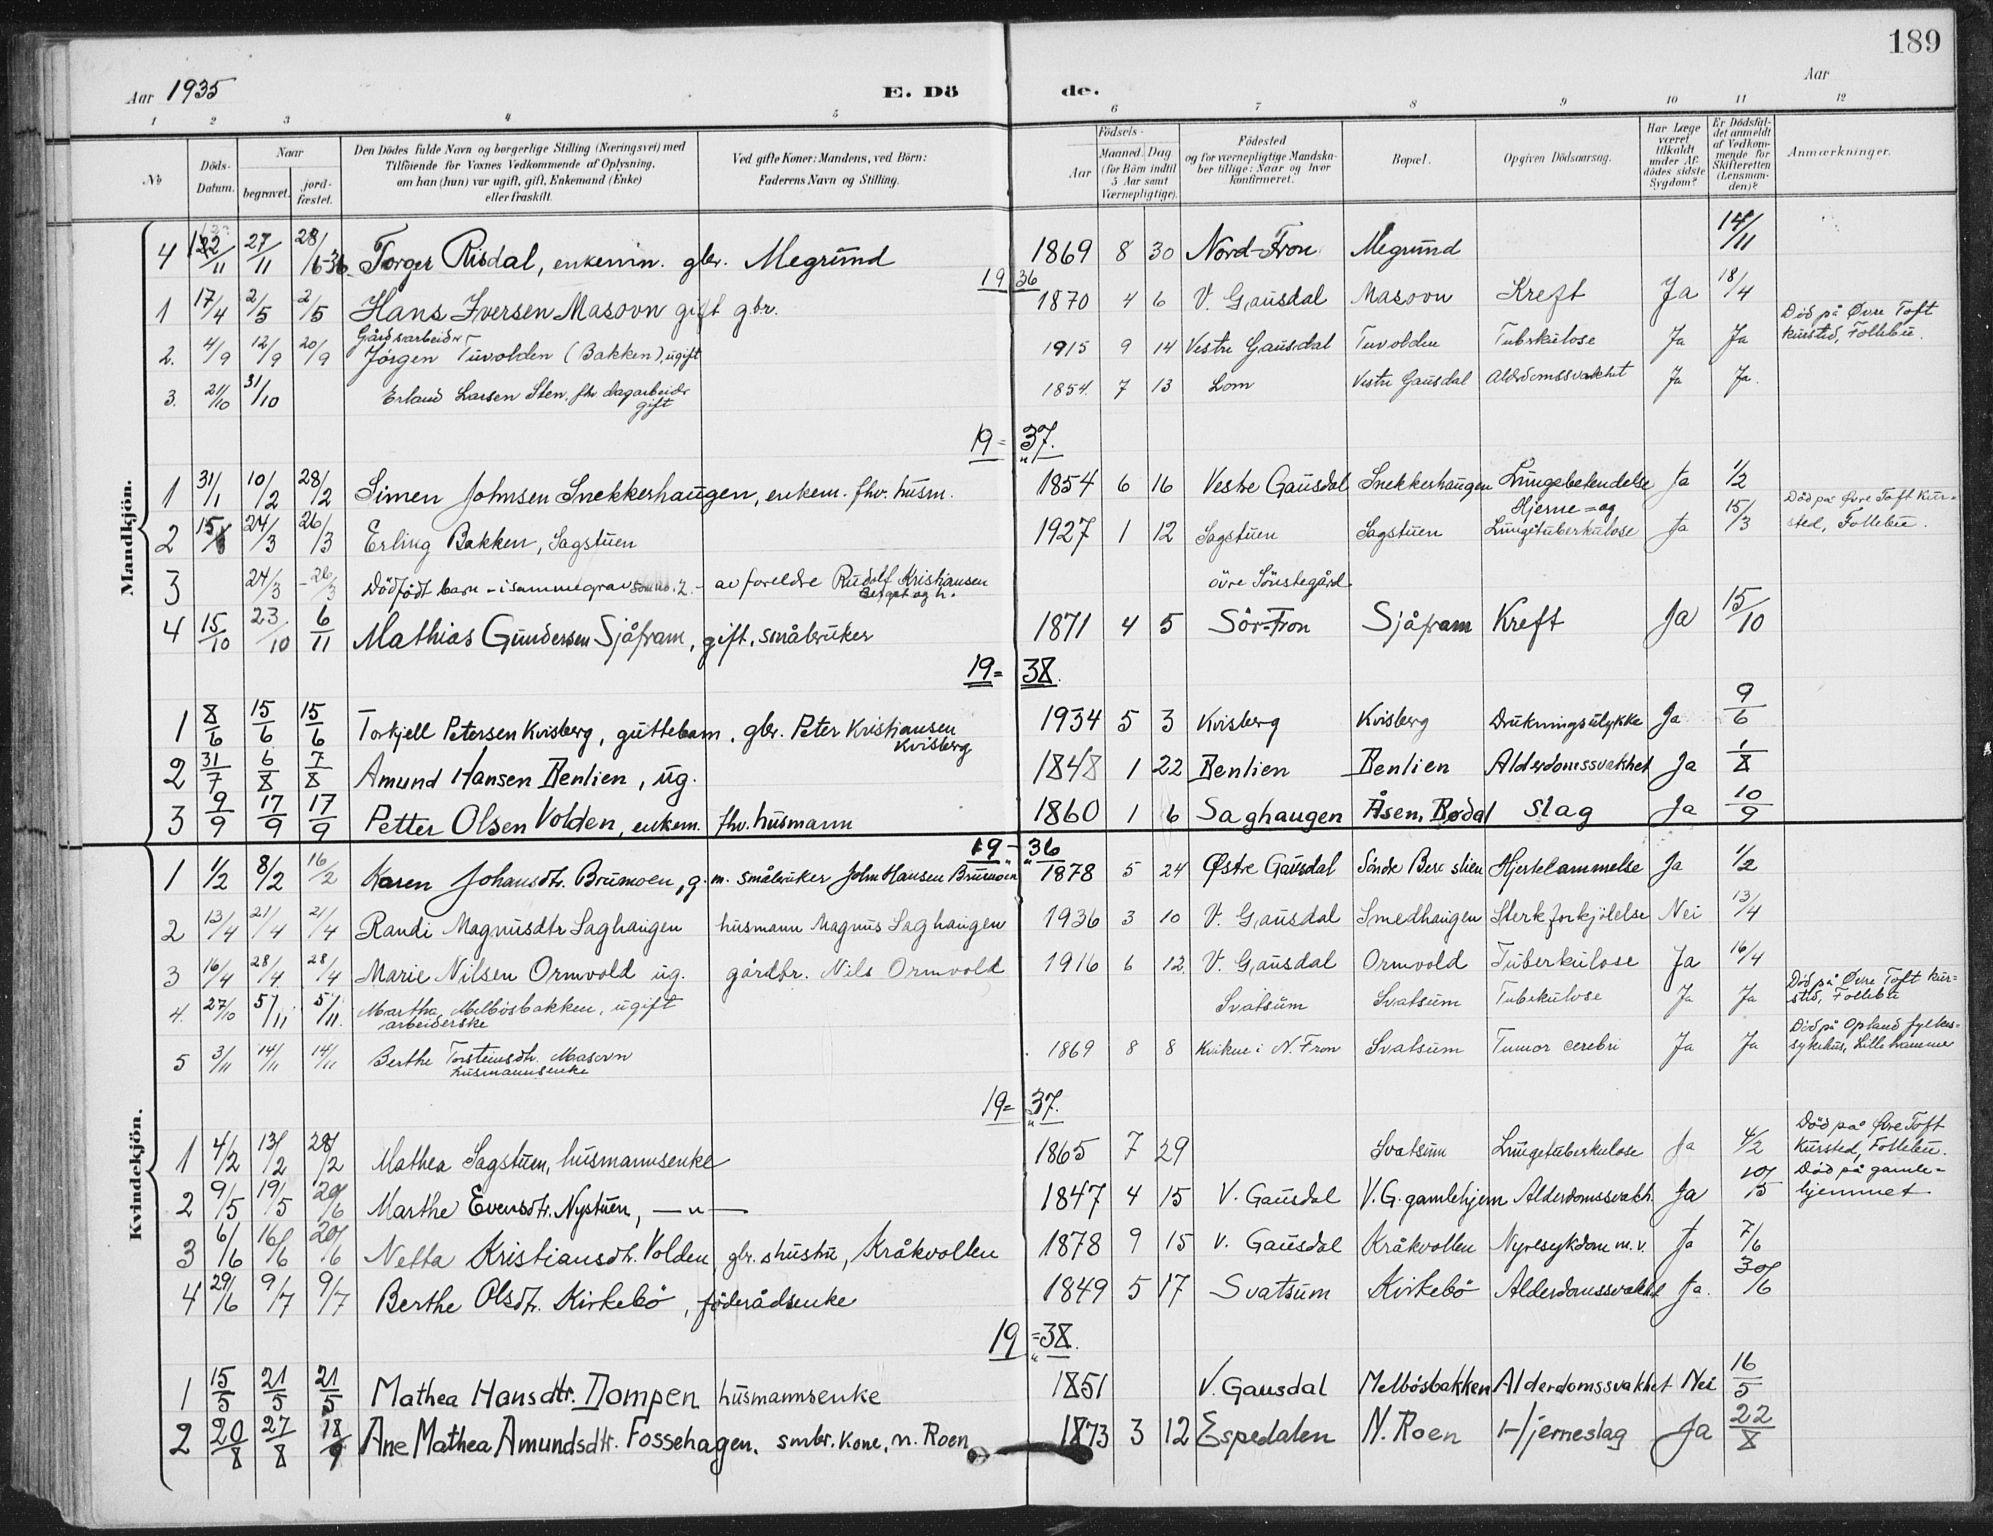 SAH, Vestre Gausdal prestekontor, Klokkerbok nr. 4, 1898-1939, s. 189